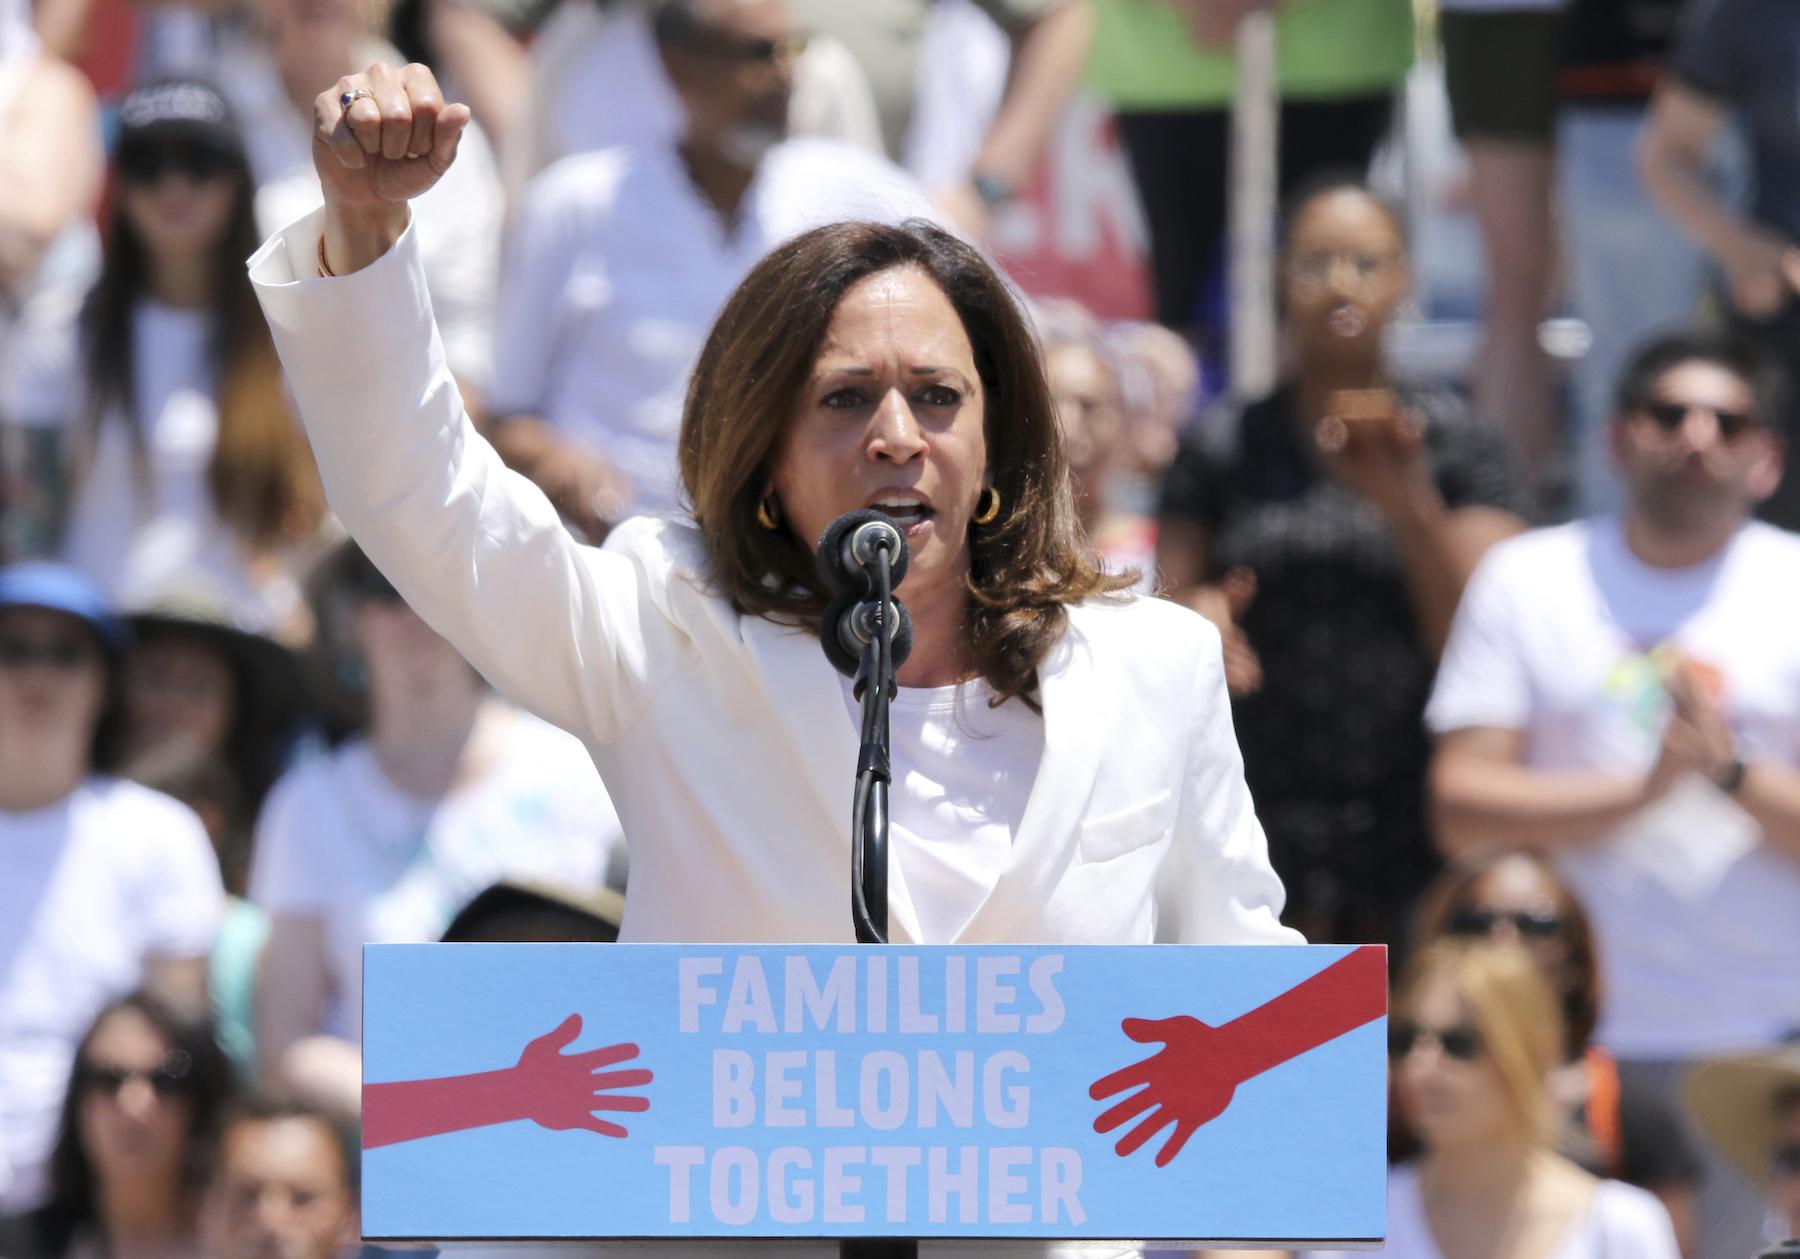 2020 Democrat candidates: List of Democrats running for